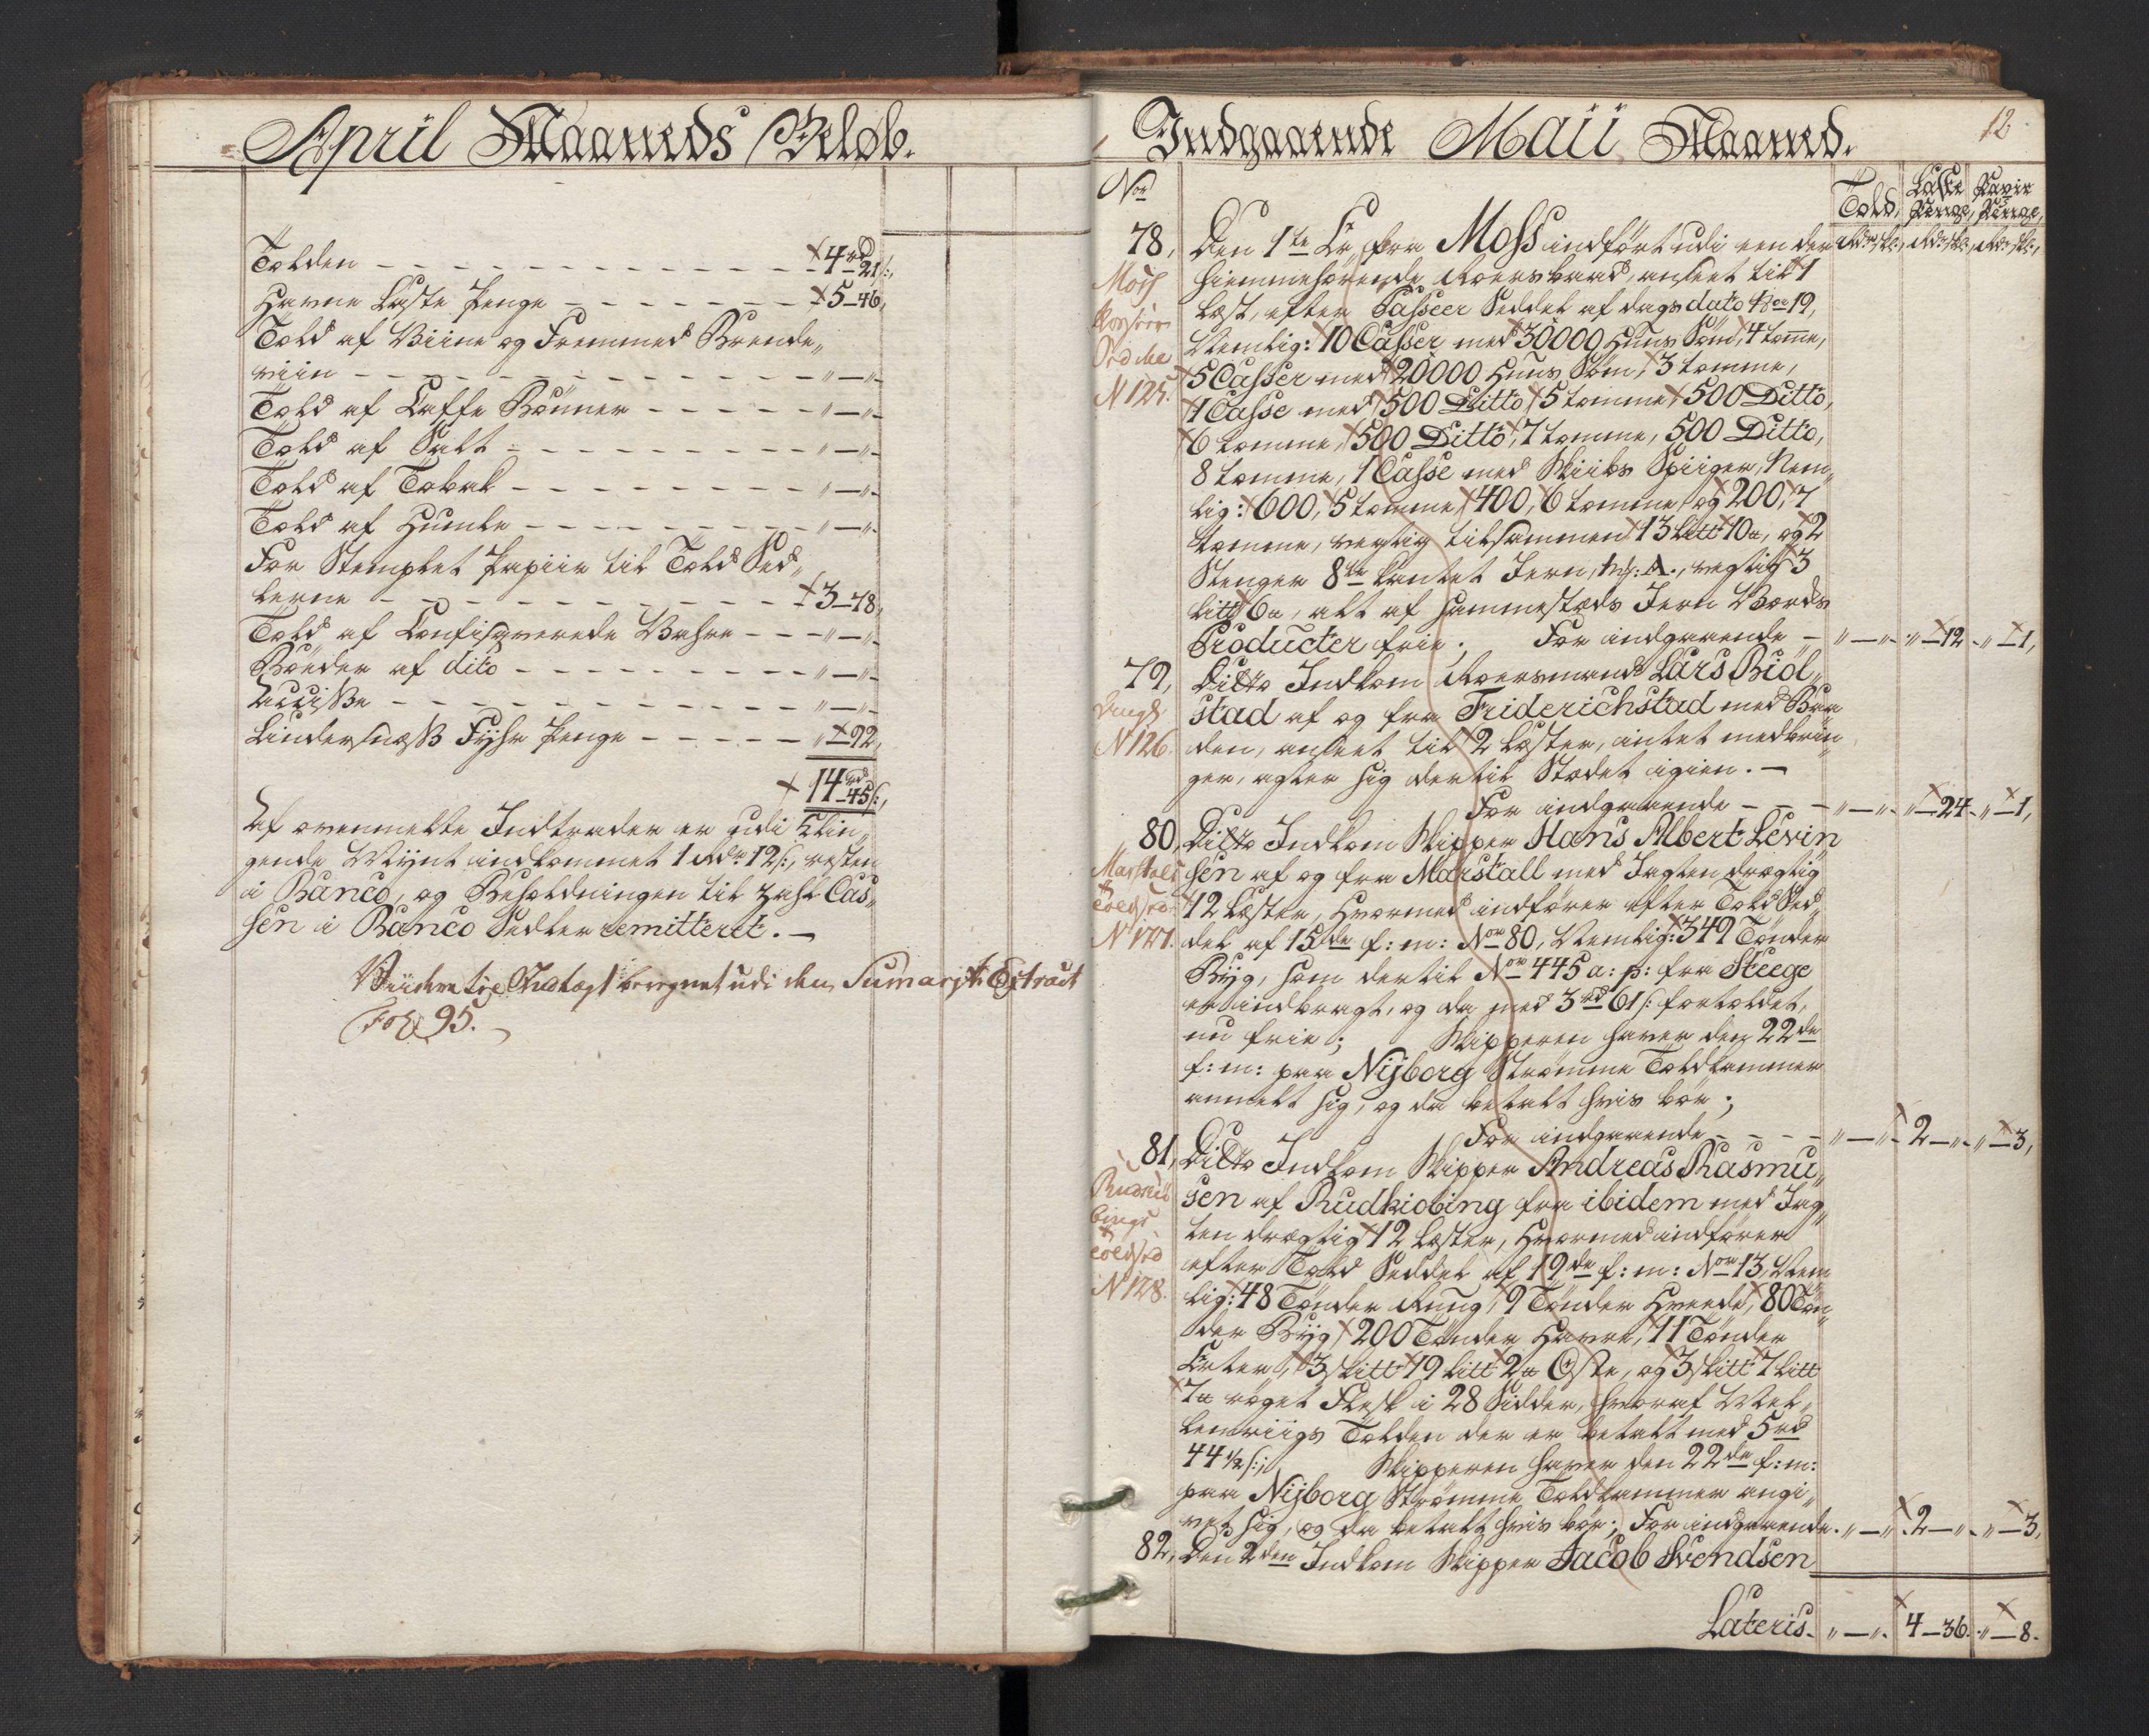 RA, Generaltollkammeret, tollregnskaper, R01/L0130: Tollregnskaper Fredrikshald, 1786, s. 11b-12a